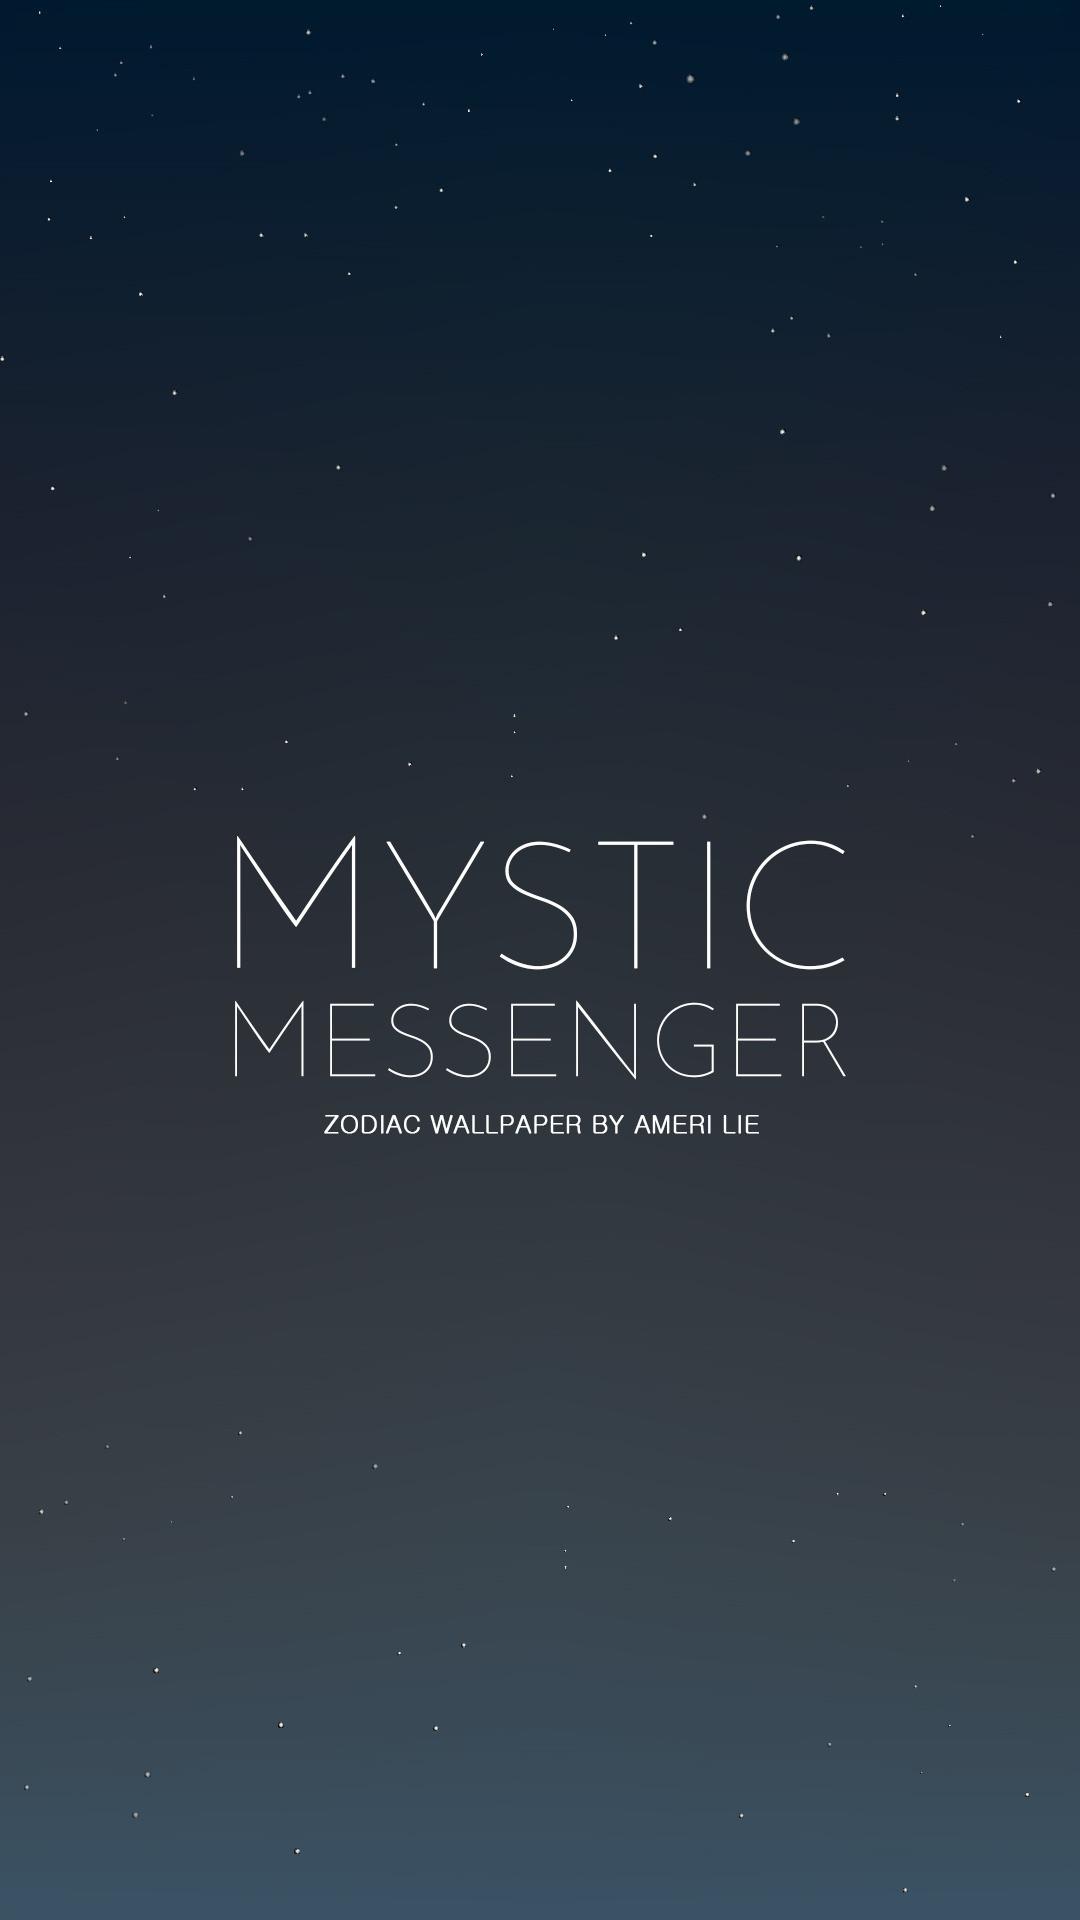 messenger background wallpaper 28 images mystic